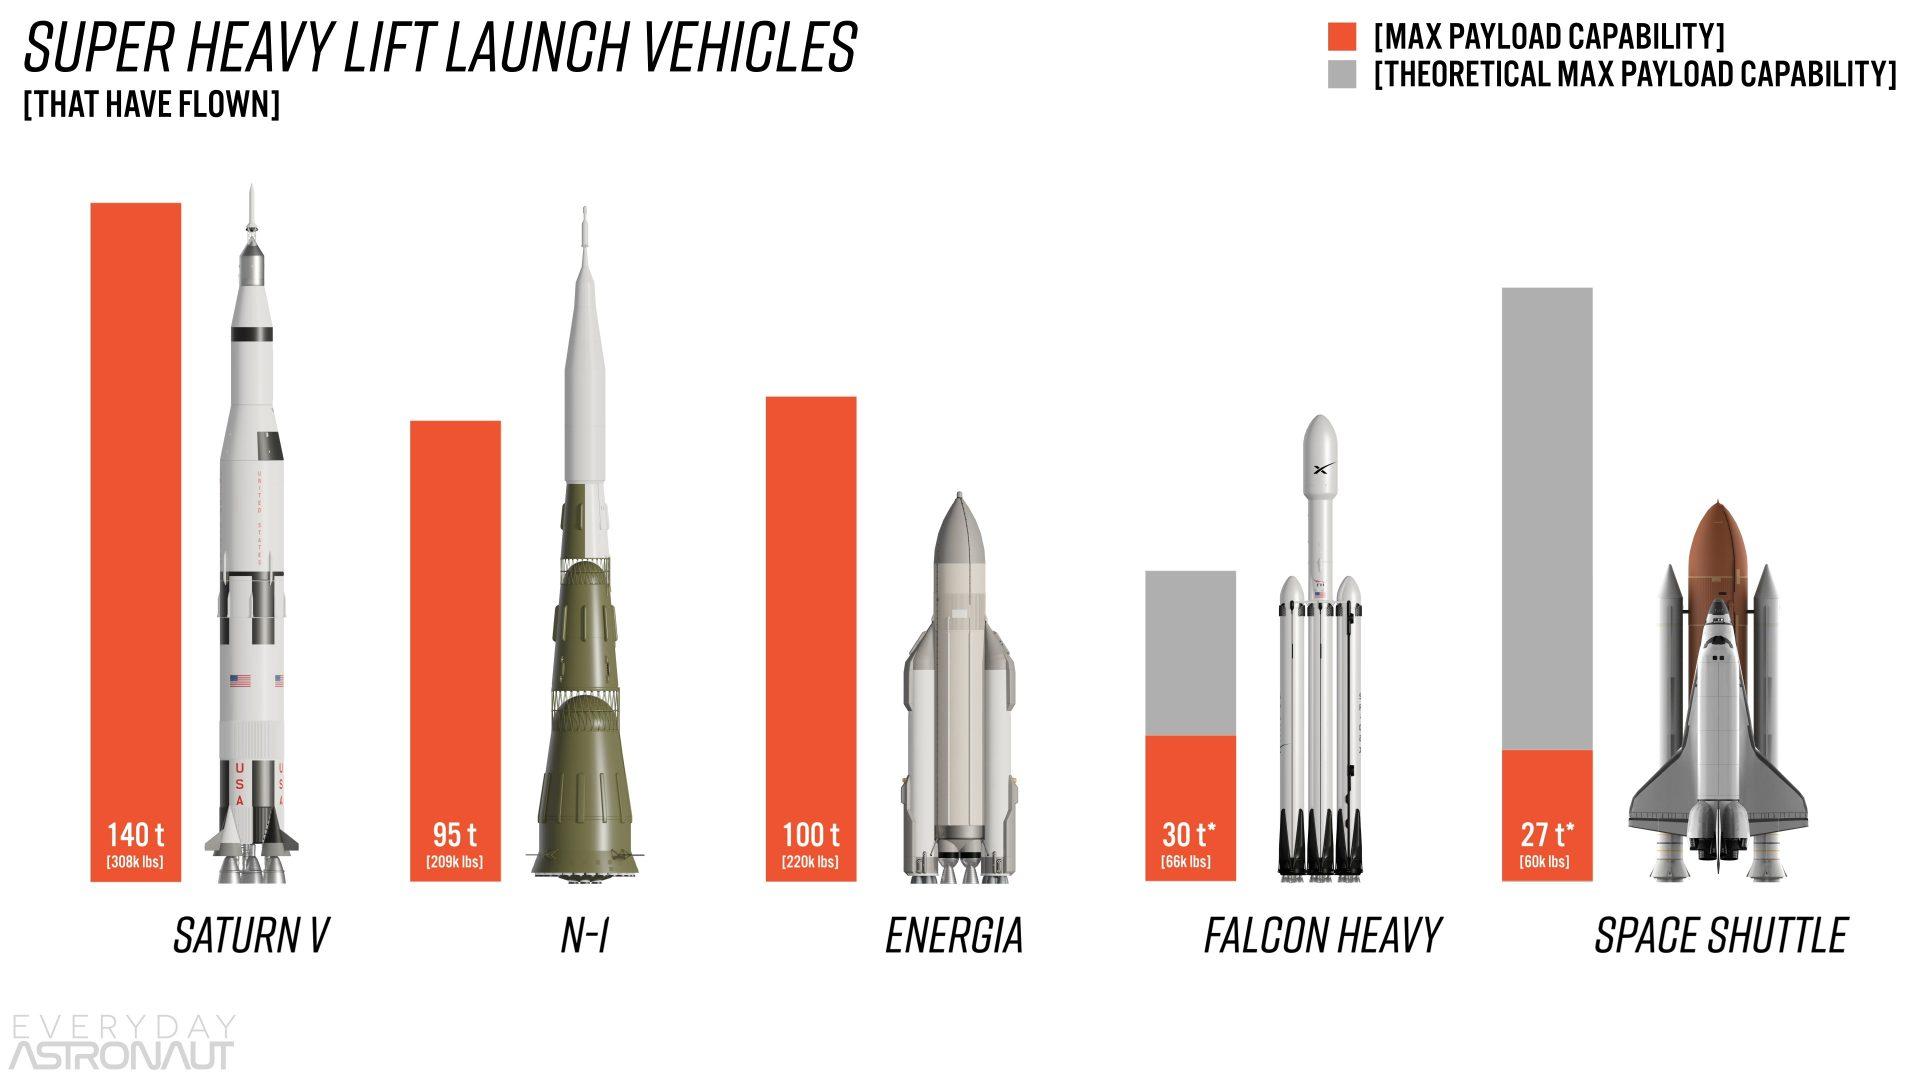 Super Heavy Lift Launch Vehicle Capabilities Saturn V vs N1 vs Energia vs Falcon Heavy vs Space Shuttle